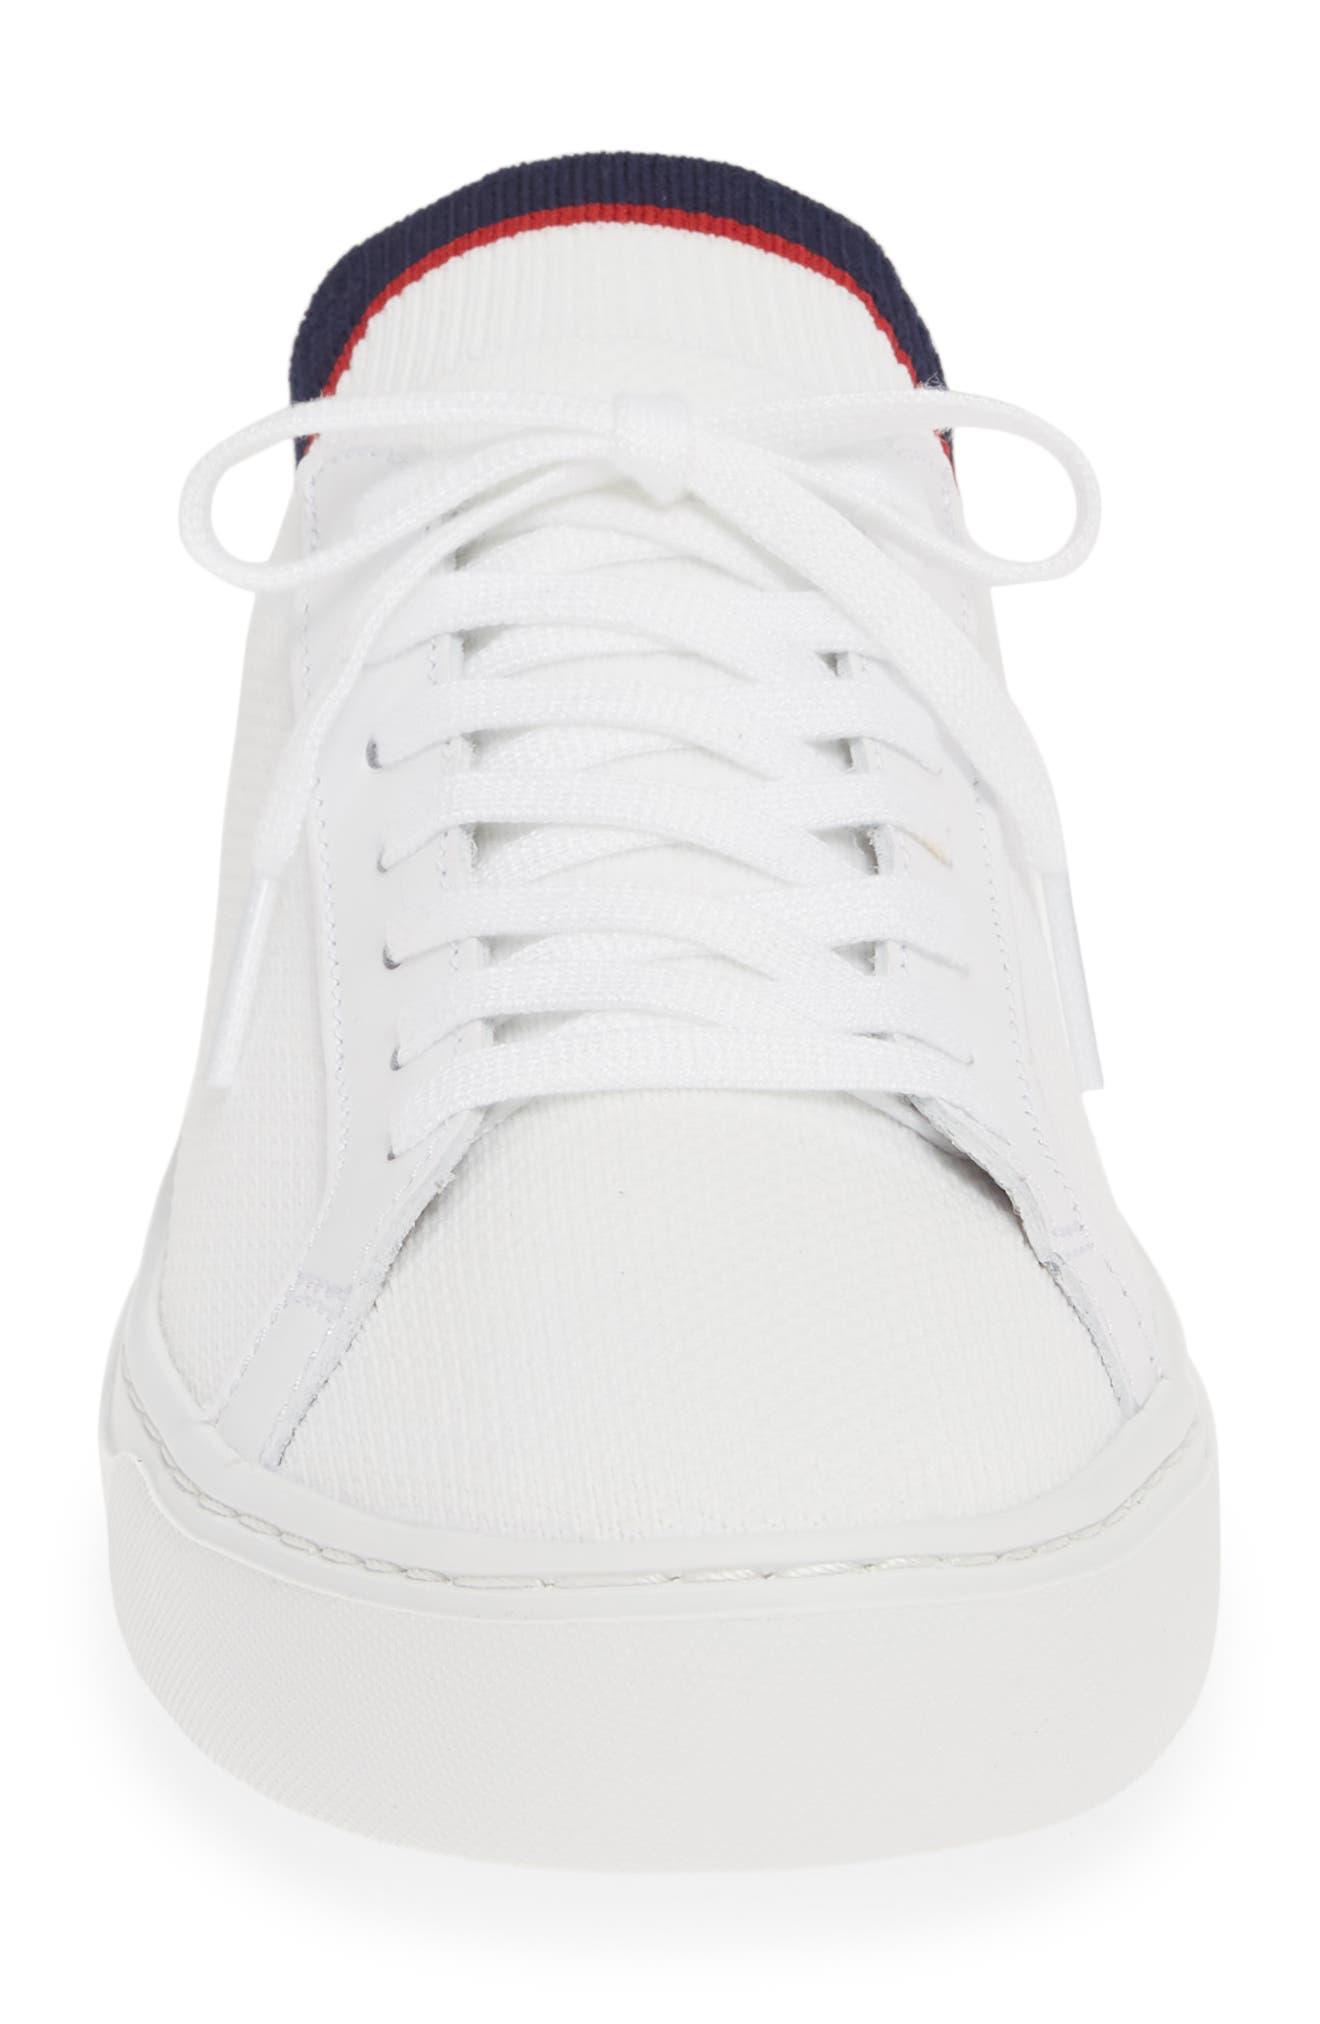 LACOSTE, Piqué Knit Sneaker, Alternate thumbnail 4, color, WHITE/ NAVY/ RED